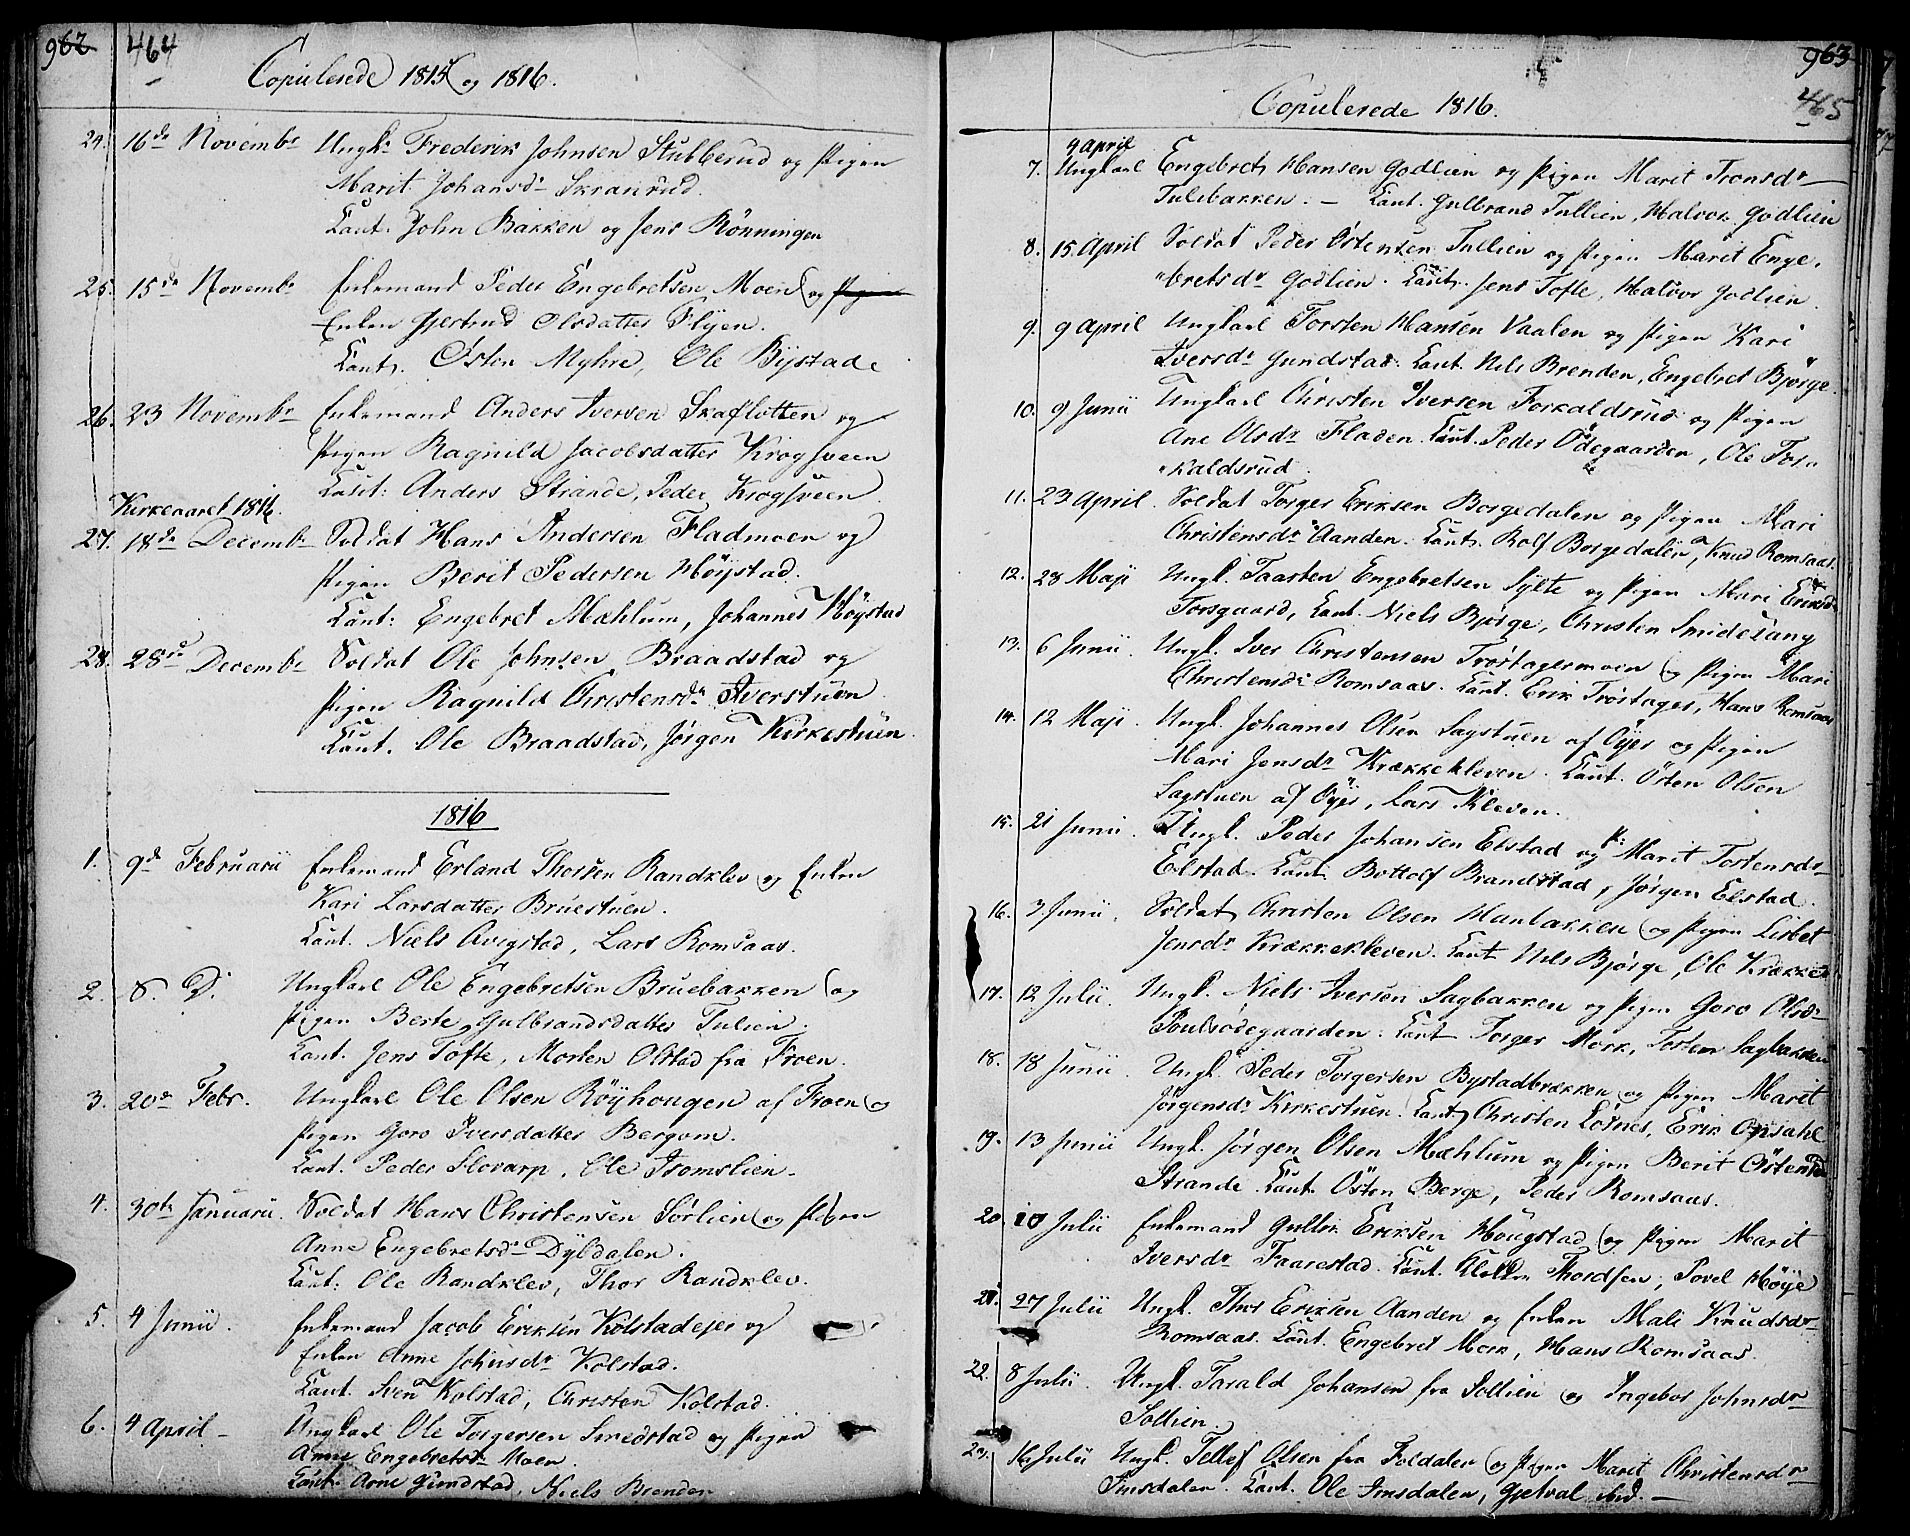 SAH, Ringebu prestekontor, Ministerialbok nr. 3, 1781-1820, s. 464-465